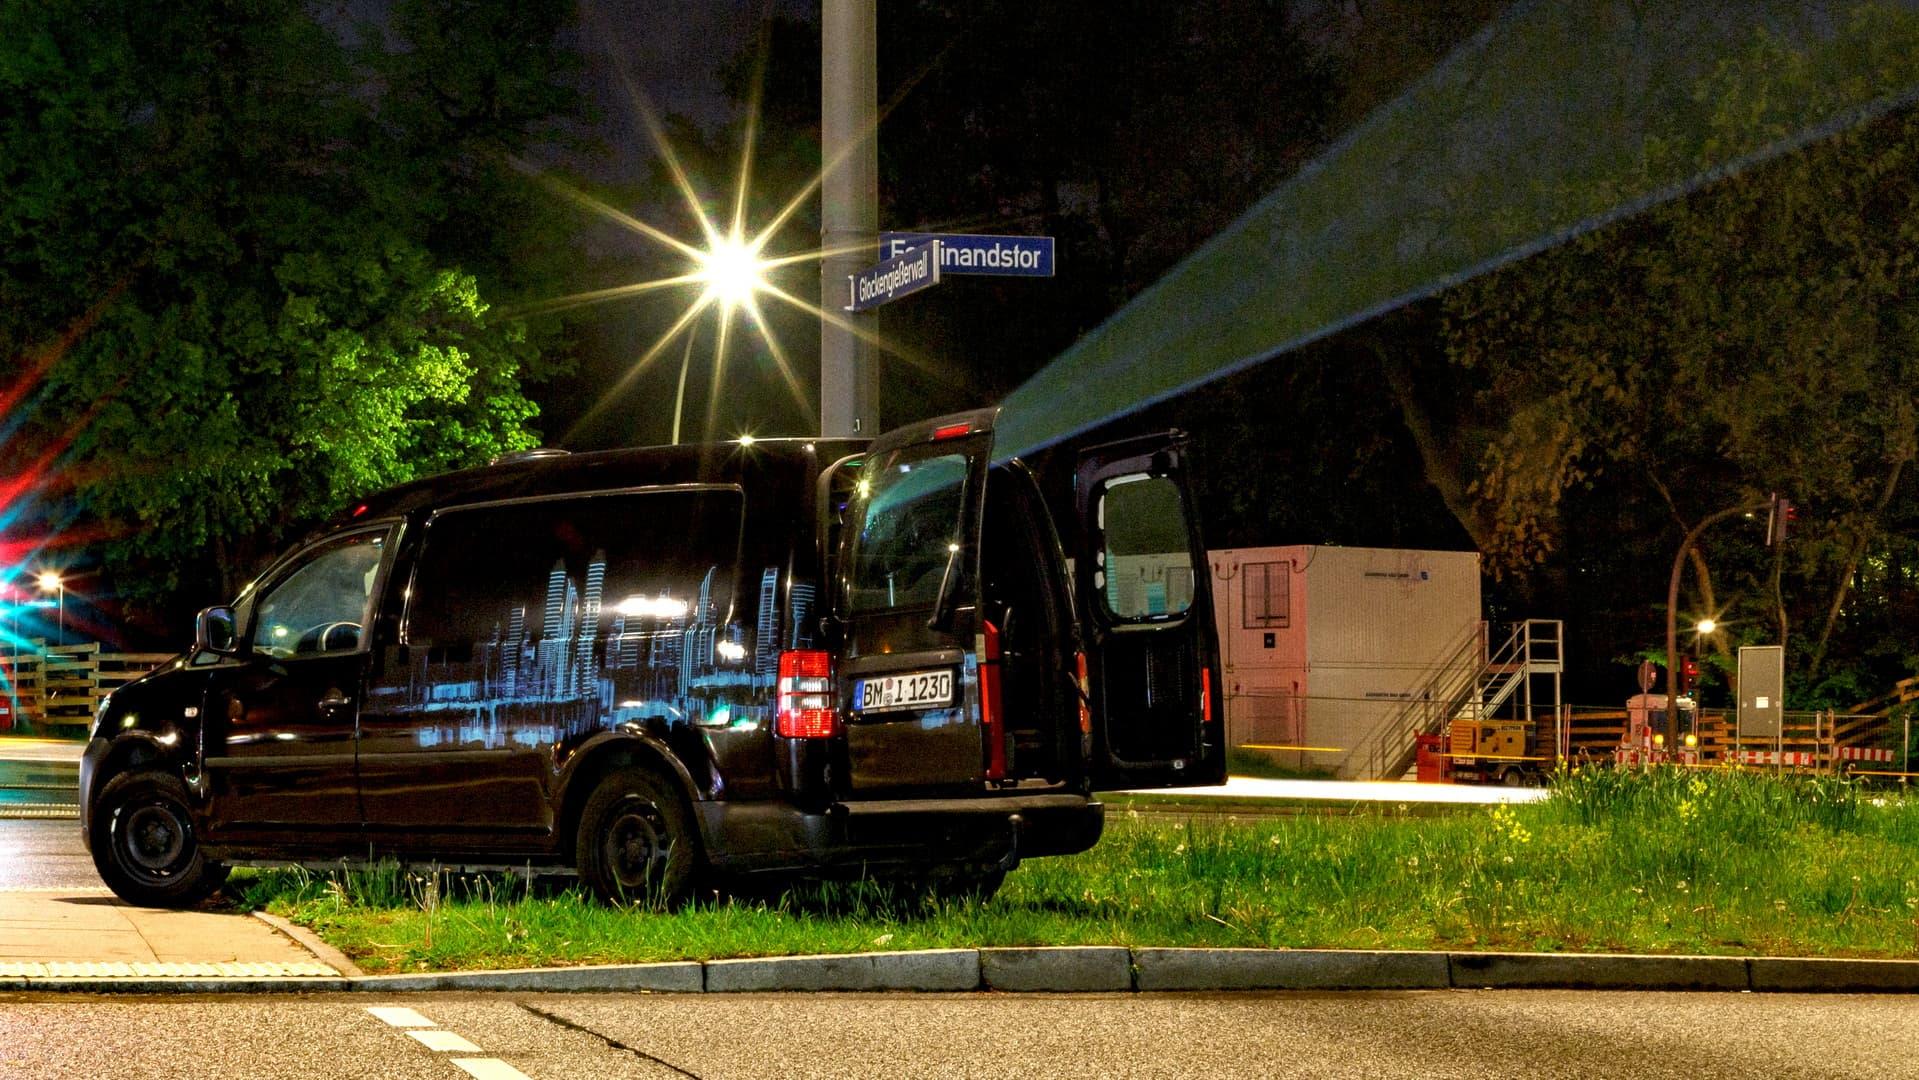 digitales Riesenposter Udo Lindenberg Projektionsfahrzeug